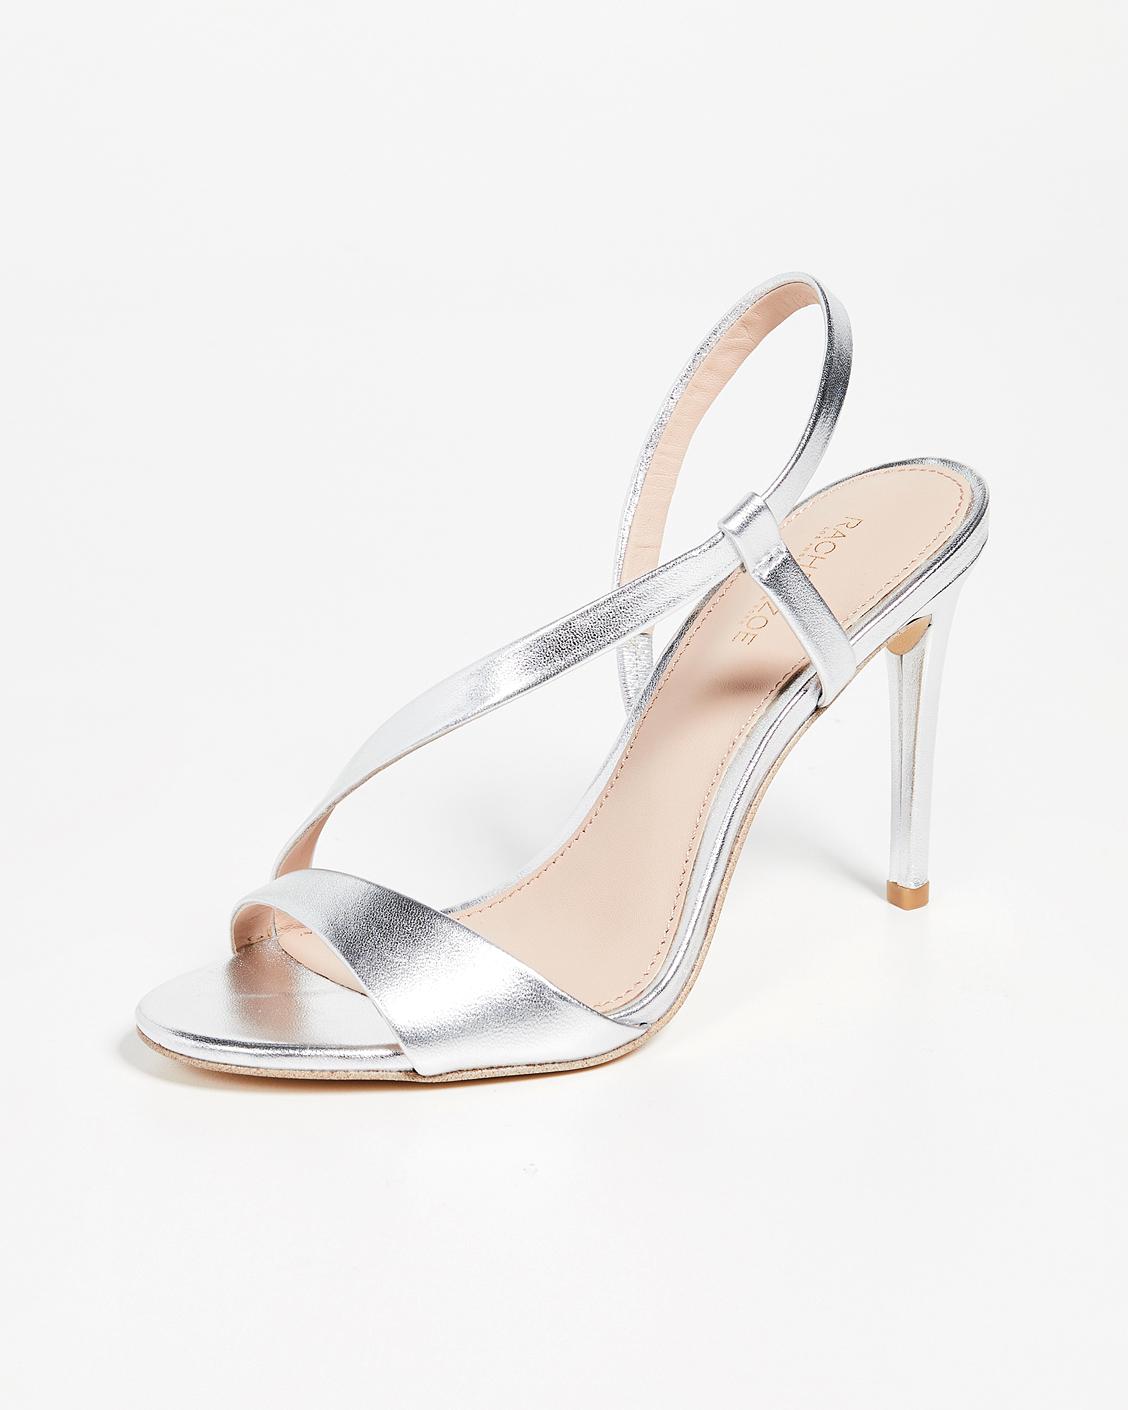 asymmetrical silver sandals bridesmaid shoes